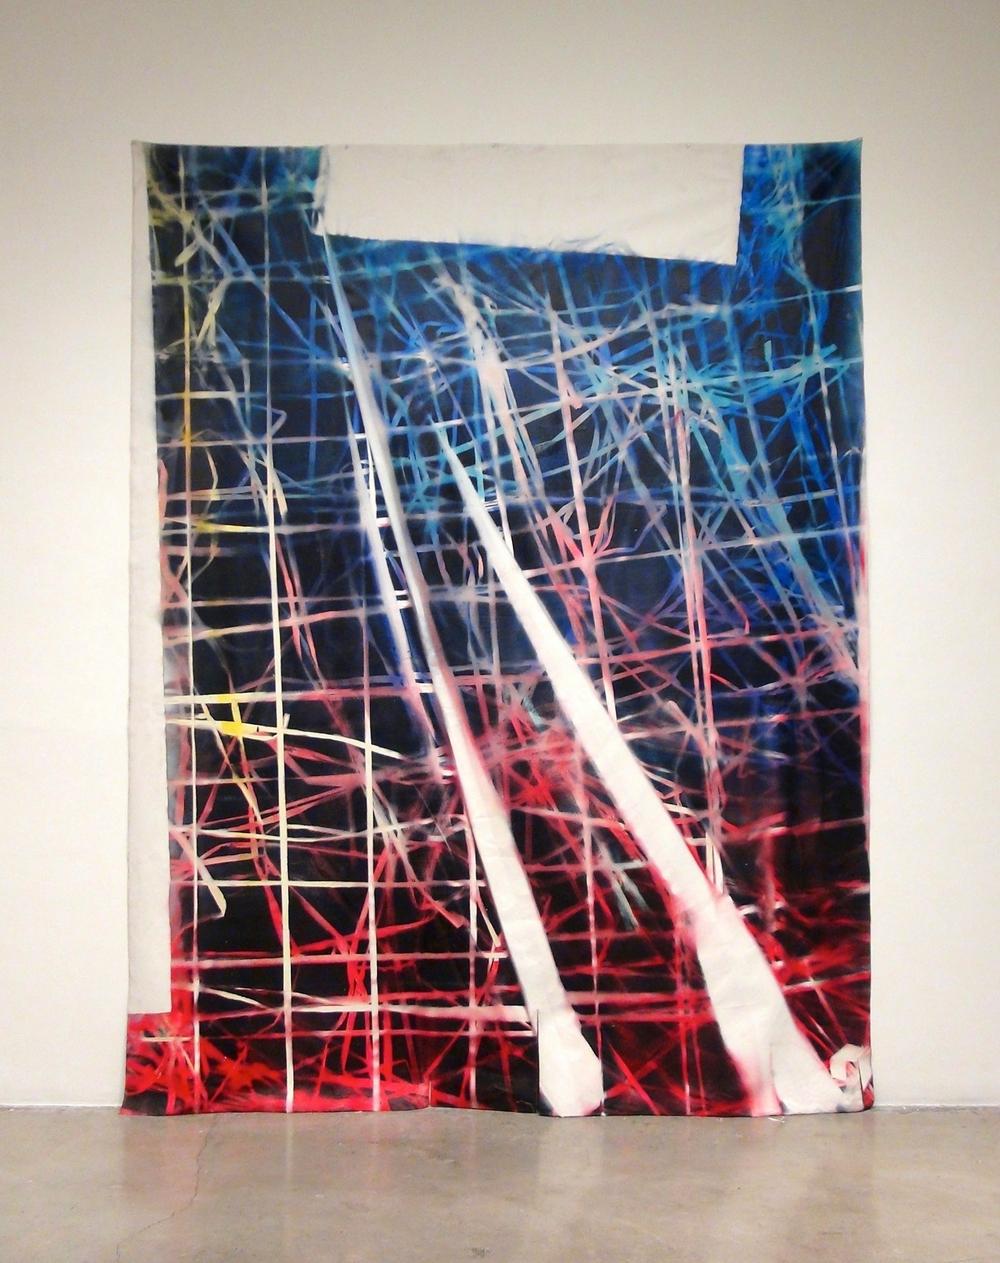 IAIN MUIRHEAD   1514  , 2015. Airborne pigment, acrylic binder, 10oz cotton duck canvas, white titanium gesso, milled pine, pushpins.125.5 x 96 inches.